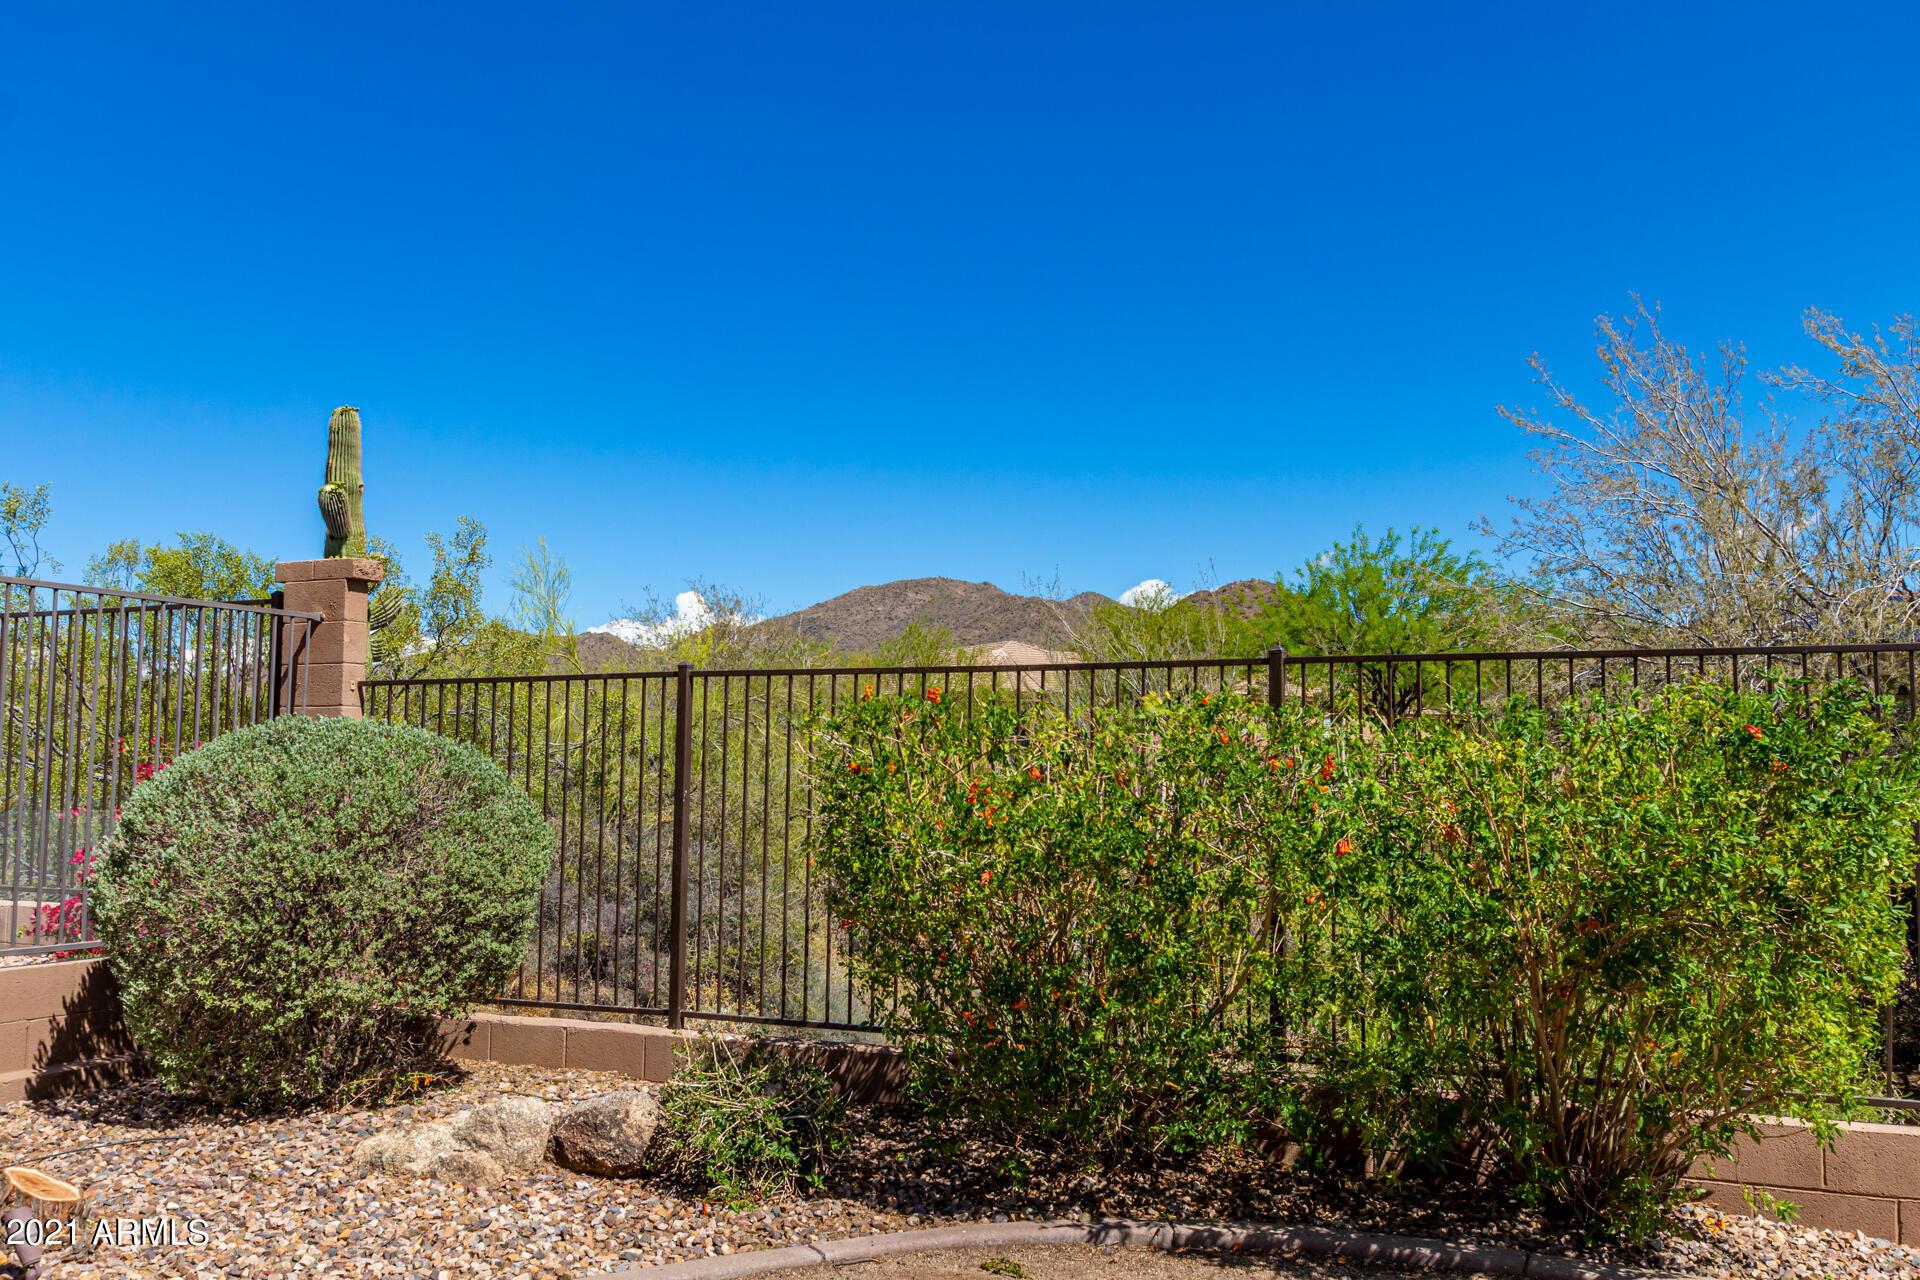 1312 WAYNE Court, Anthem, Arizona 85086, 4 Bedrooms Bedrooms, ,3.5 BathroomsBathrooms,Residential,For Sale,WAYNE,6227979